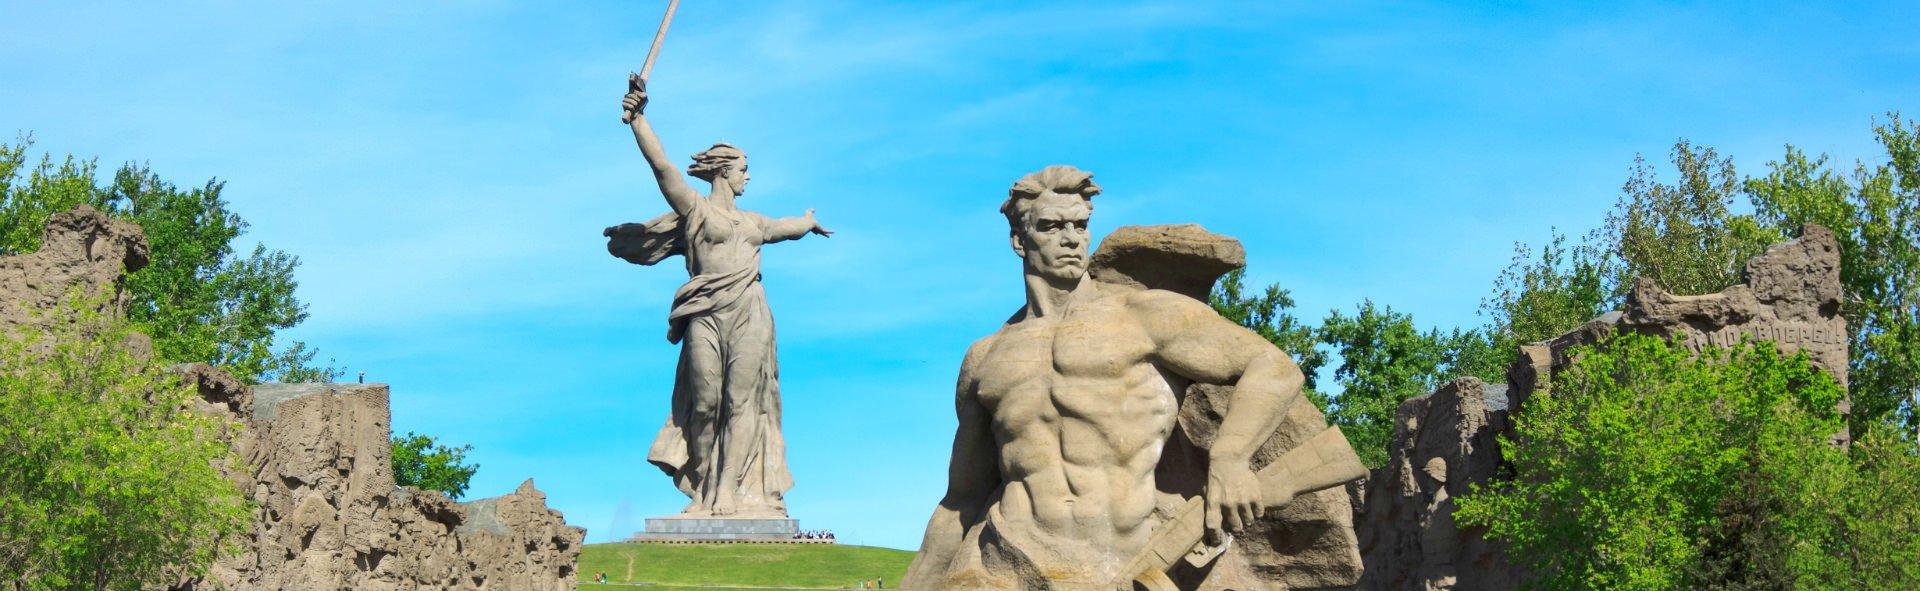 Aquapark in Volgograd: description, services, visitor reviews